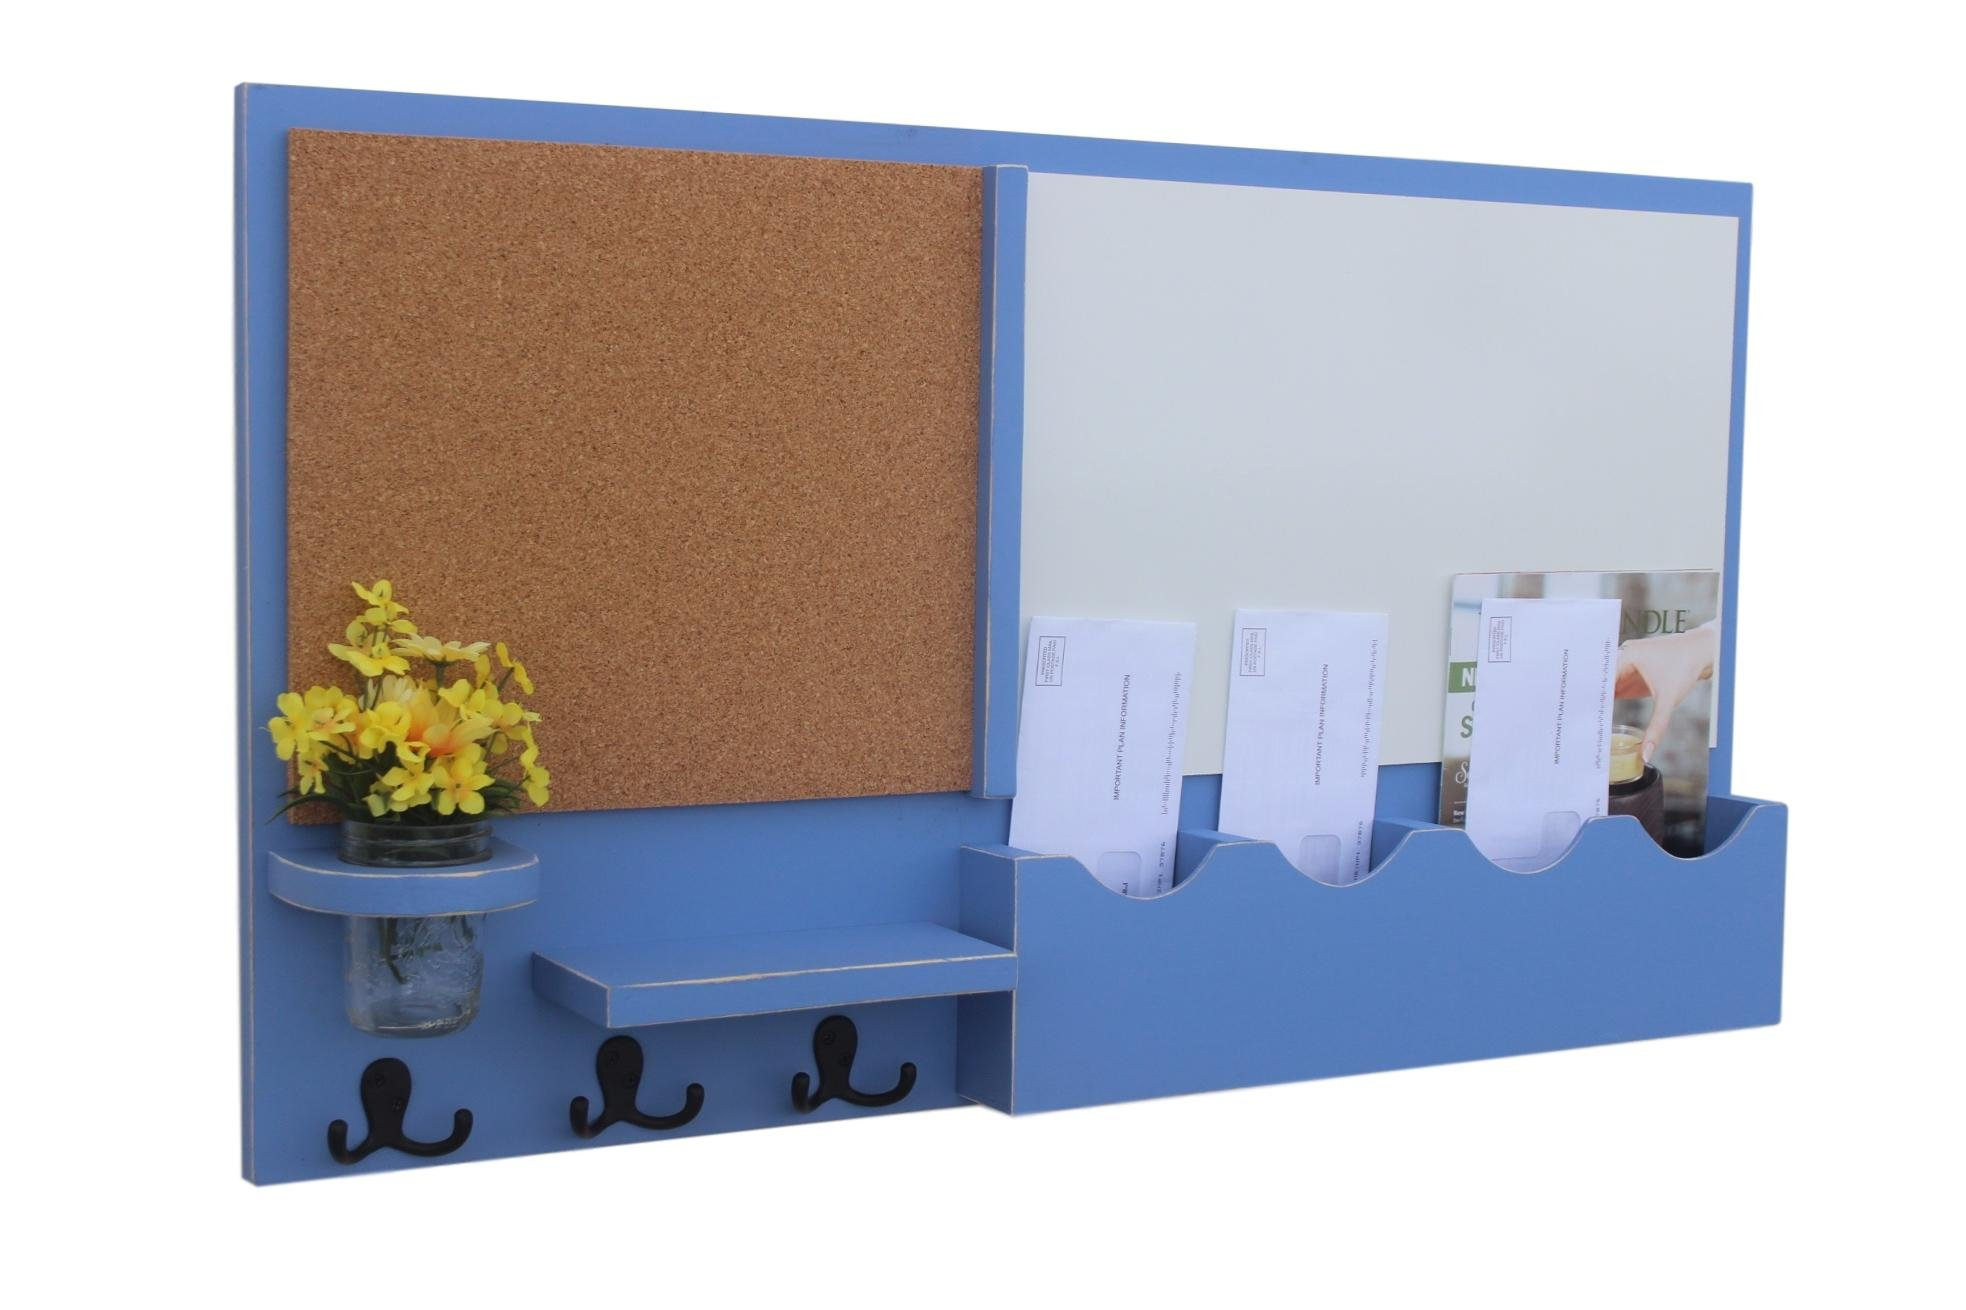 Legacy Studio Décor Message Center with White Board & Cork Board Mail Slots Key Hooks Mason Jar (Distressed, Ocean)